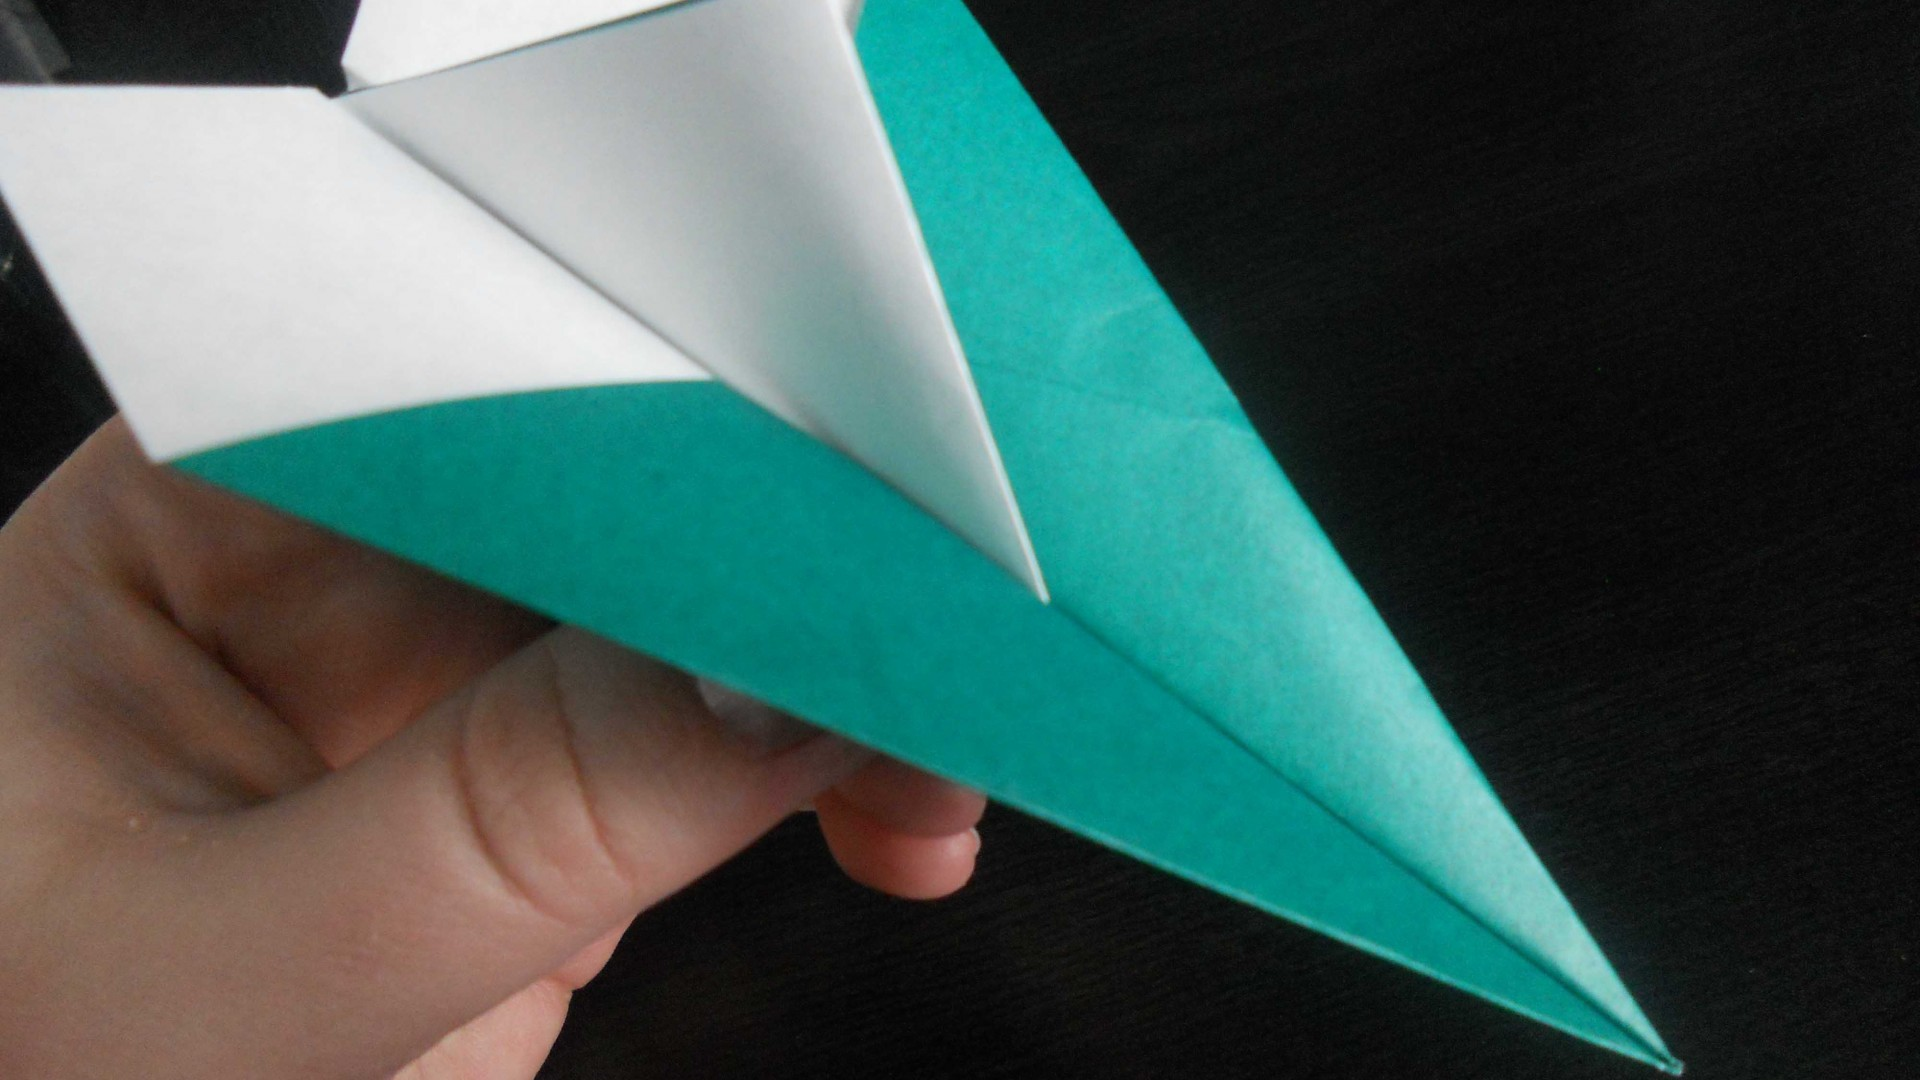 005 Impressive Printable A4 Paper Plane Design High Resolution 1920